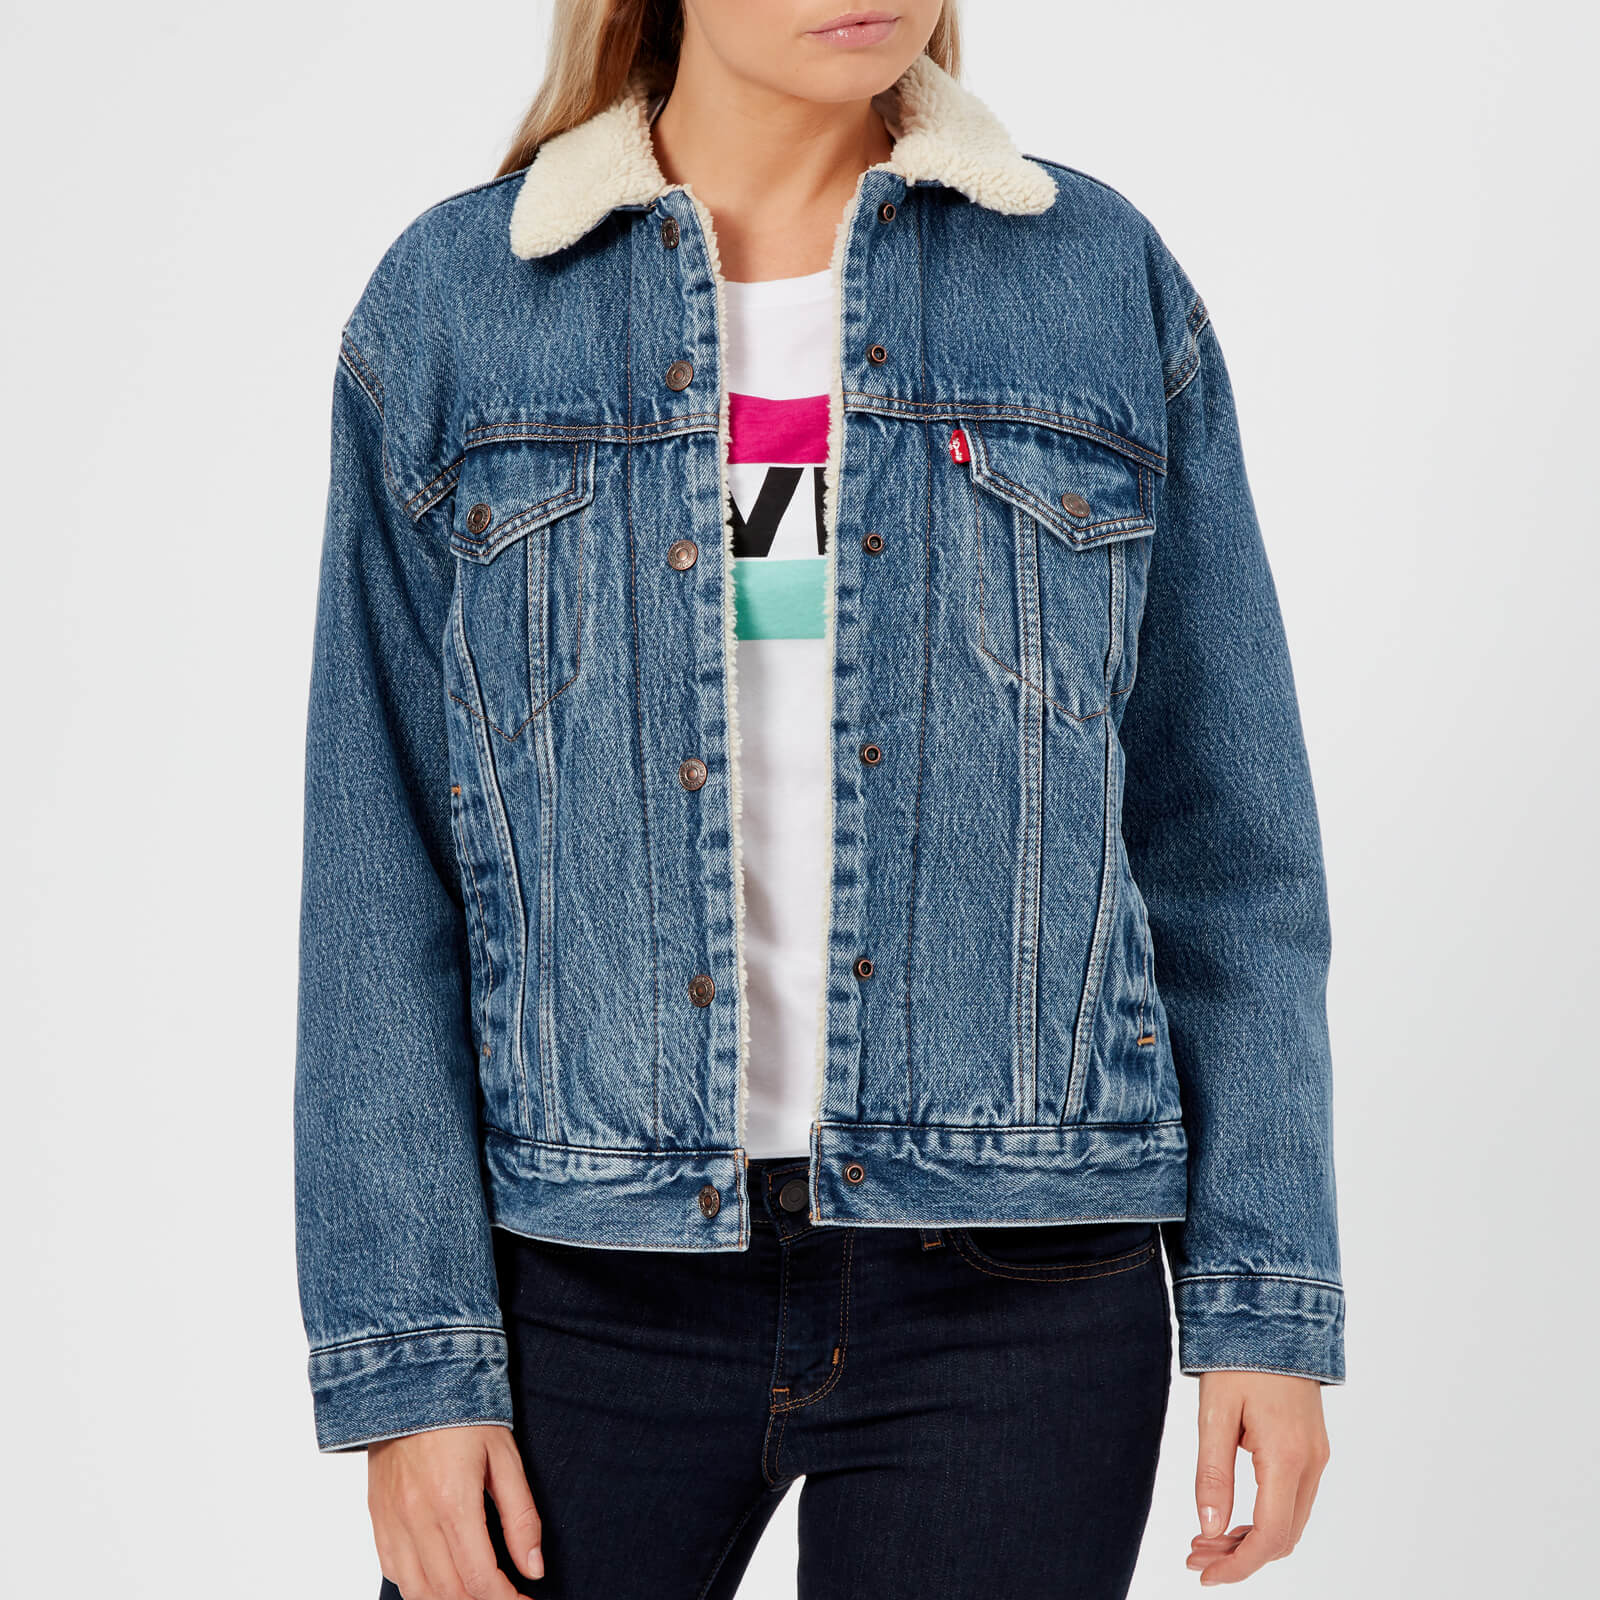 8dea7865 Levi's Women's Ex-Boyfriend Sherpa Trucker Jacket - Addicted To Love Womens  Clothing | TheHut.com